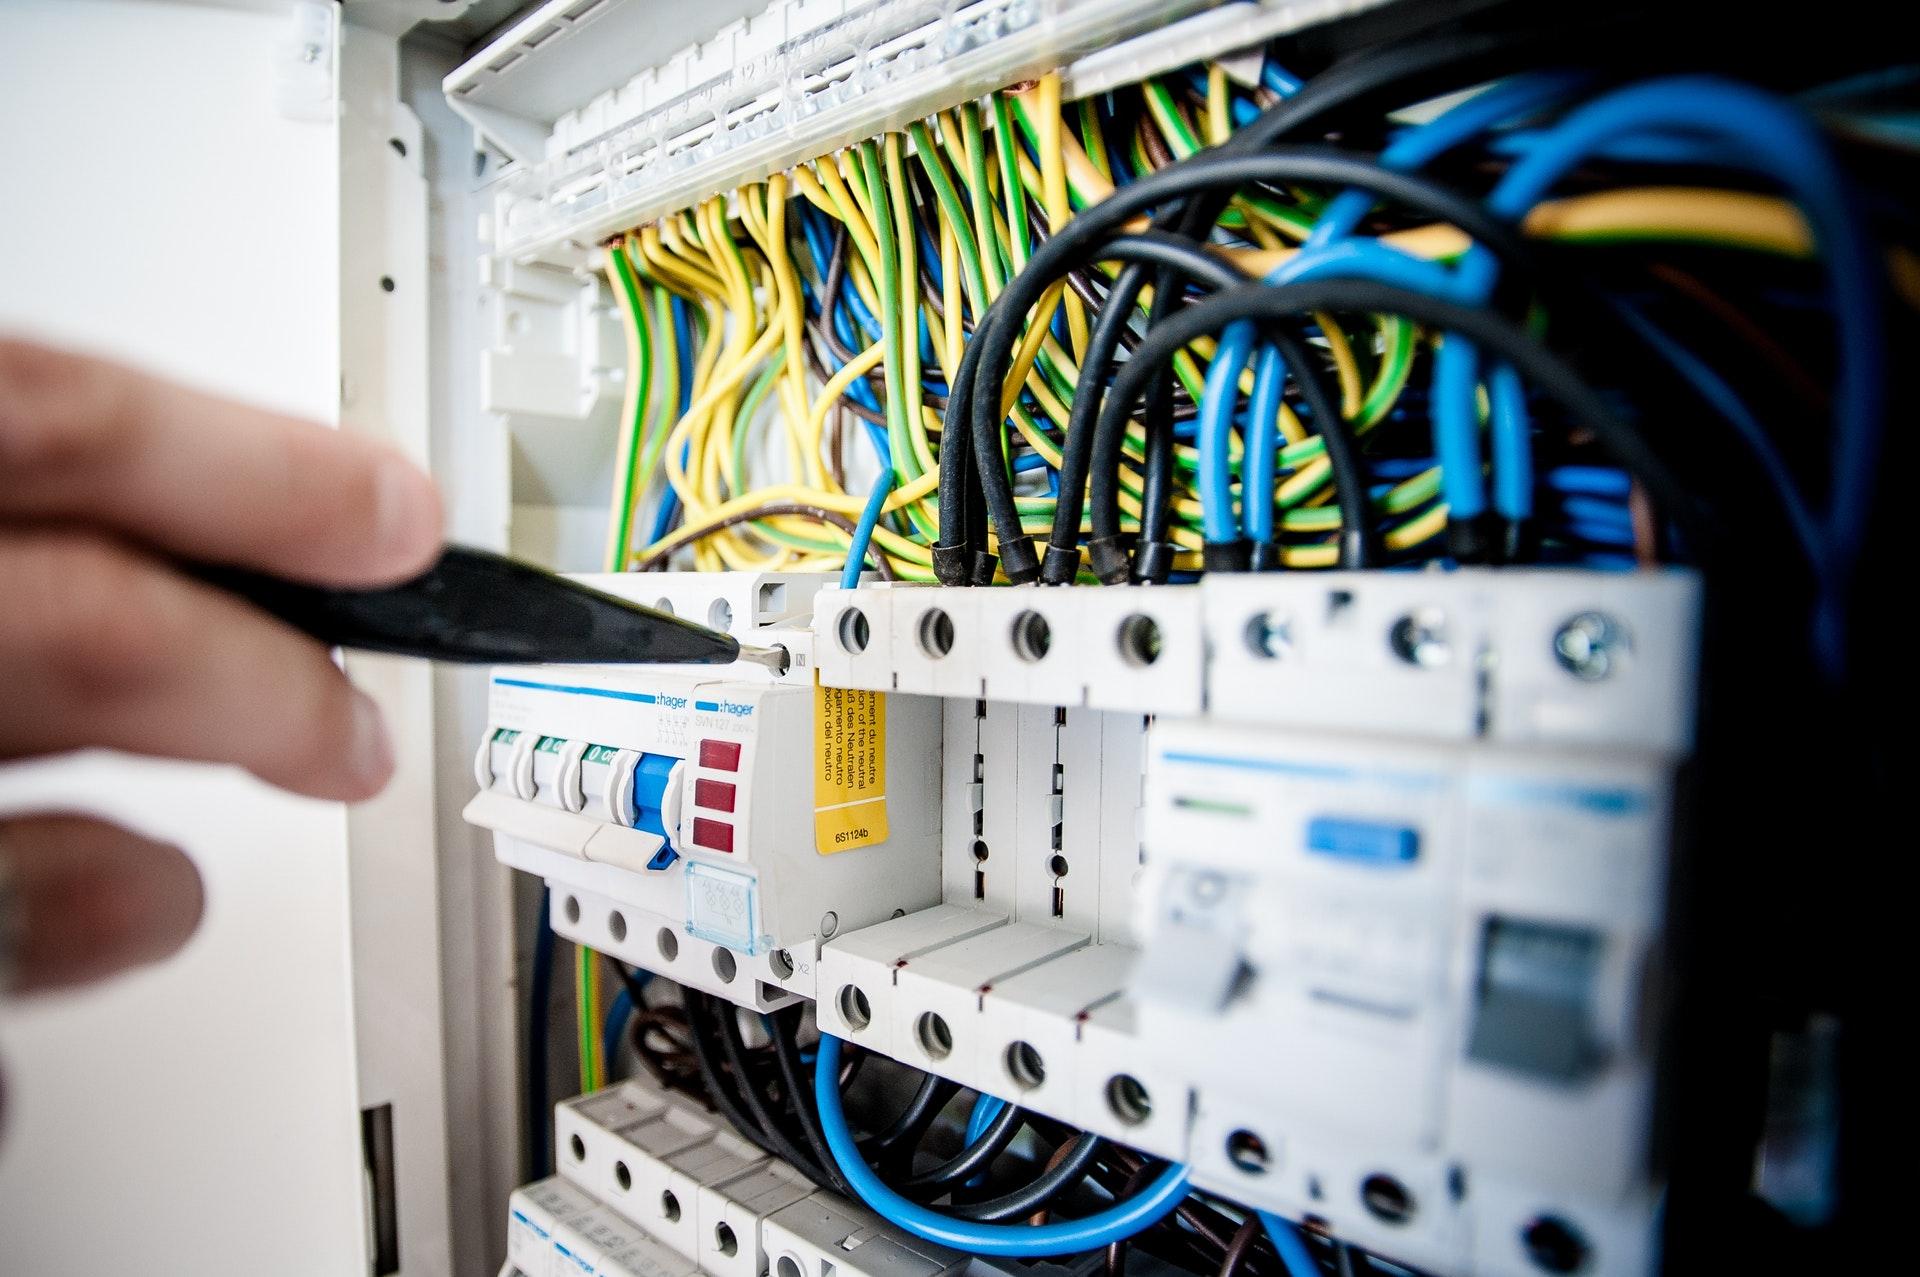 Disyuntores de panel eléctrico